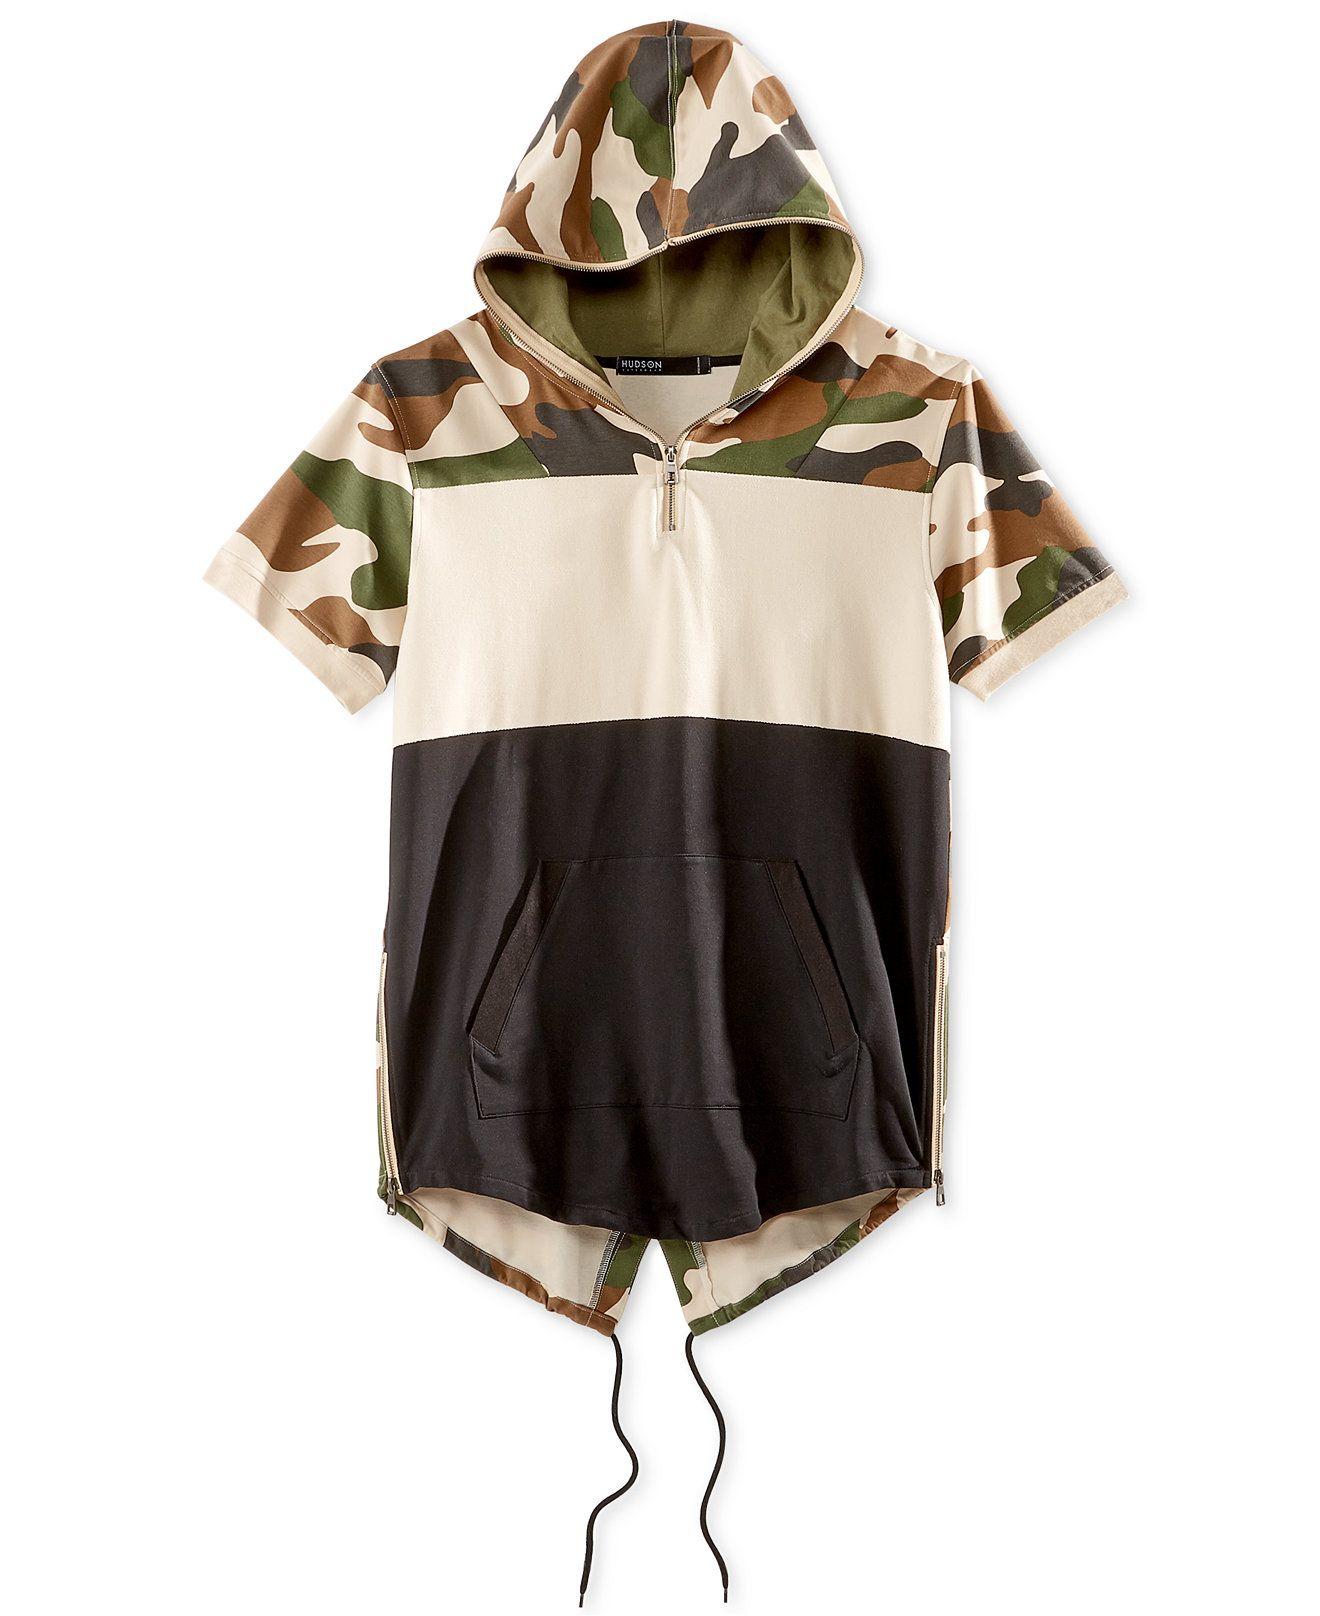 Hudson NYC Men s Colorblocked Camouflage Short-Sleeve Fishtail Hoodie -  T-Shirts - Men - Macy s 6890c82eeb